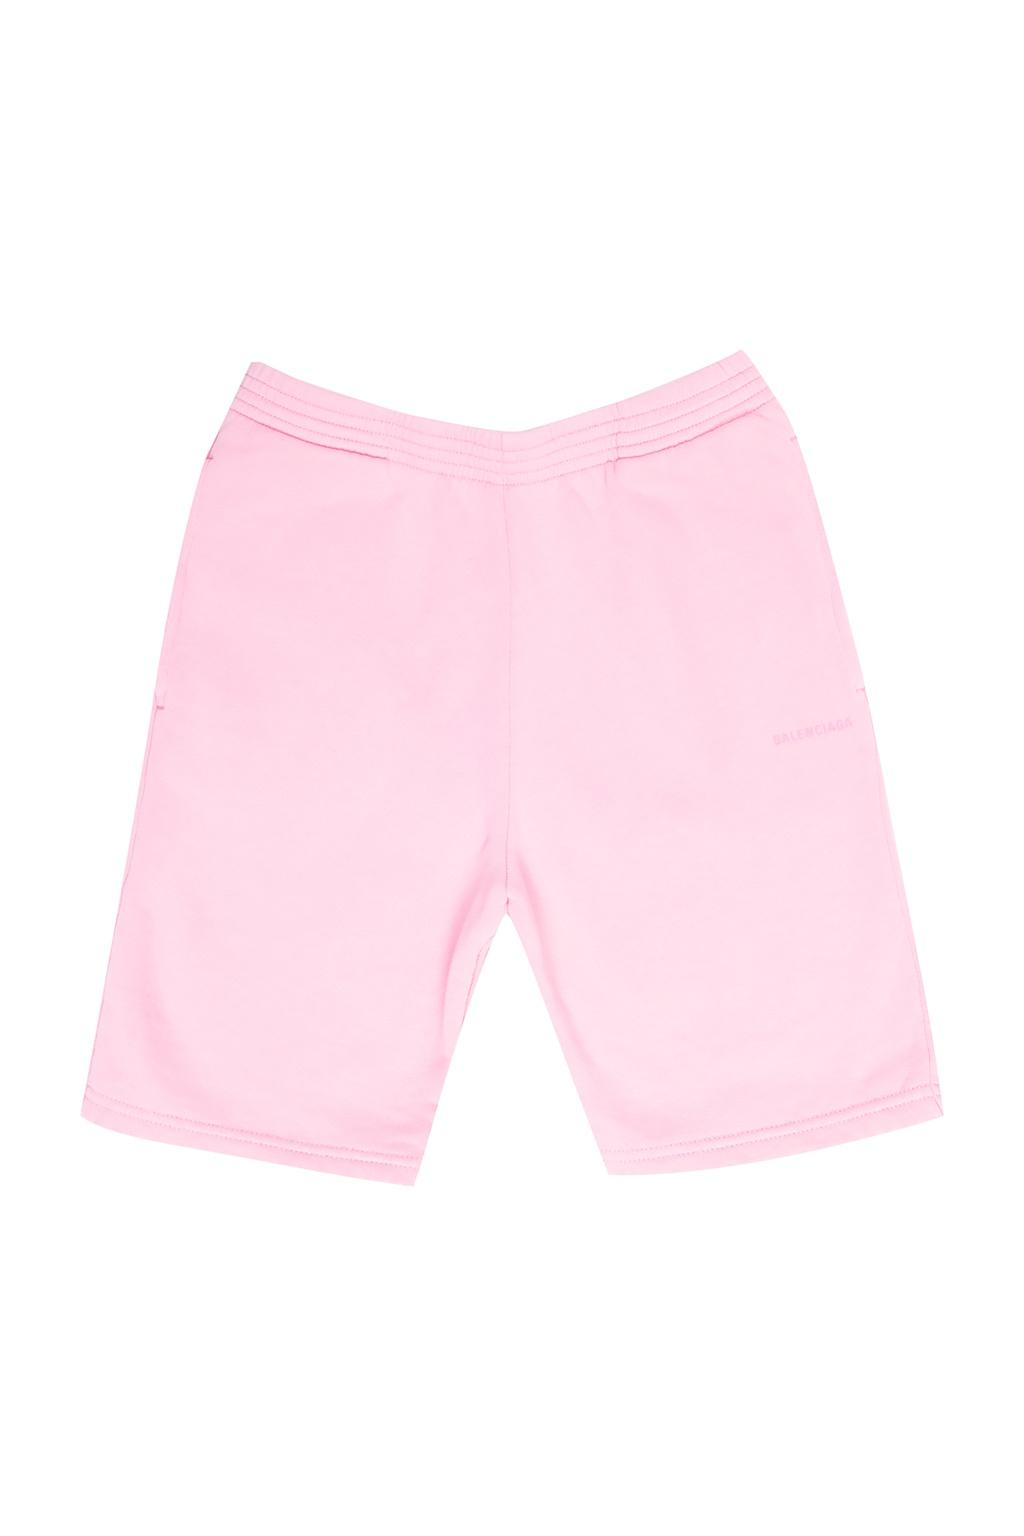 Balenciaga Kids Shorts with logo